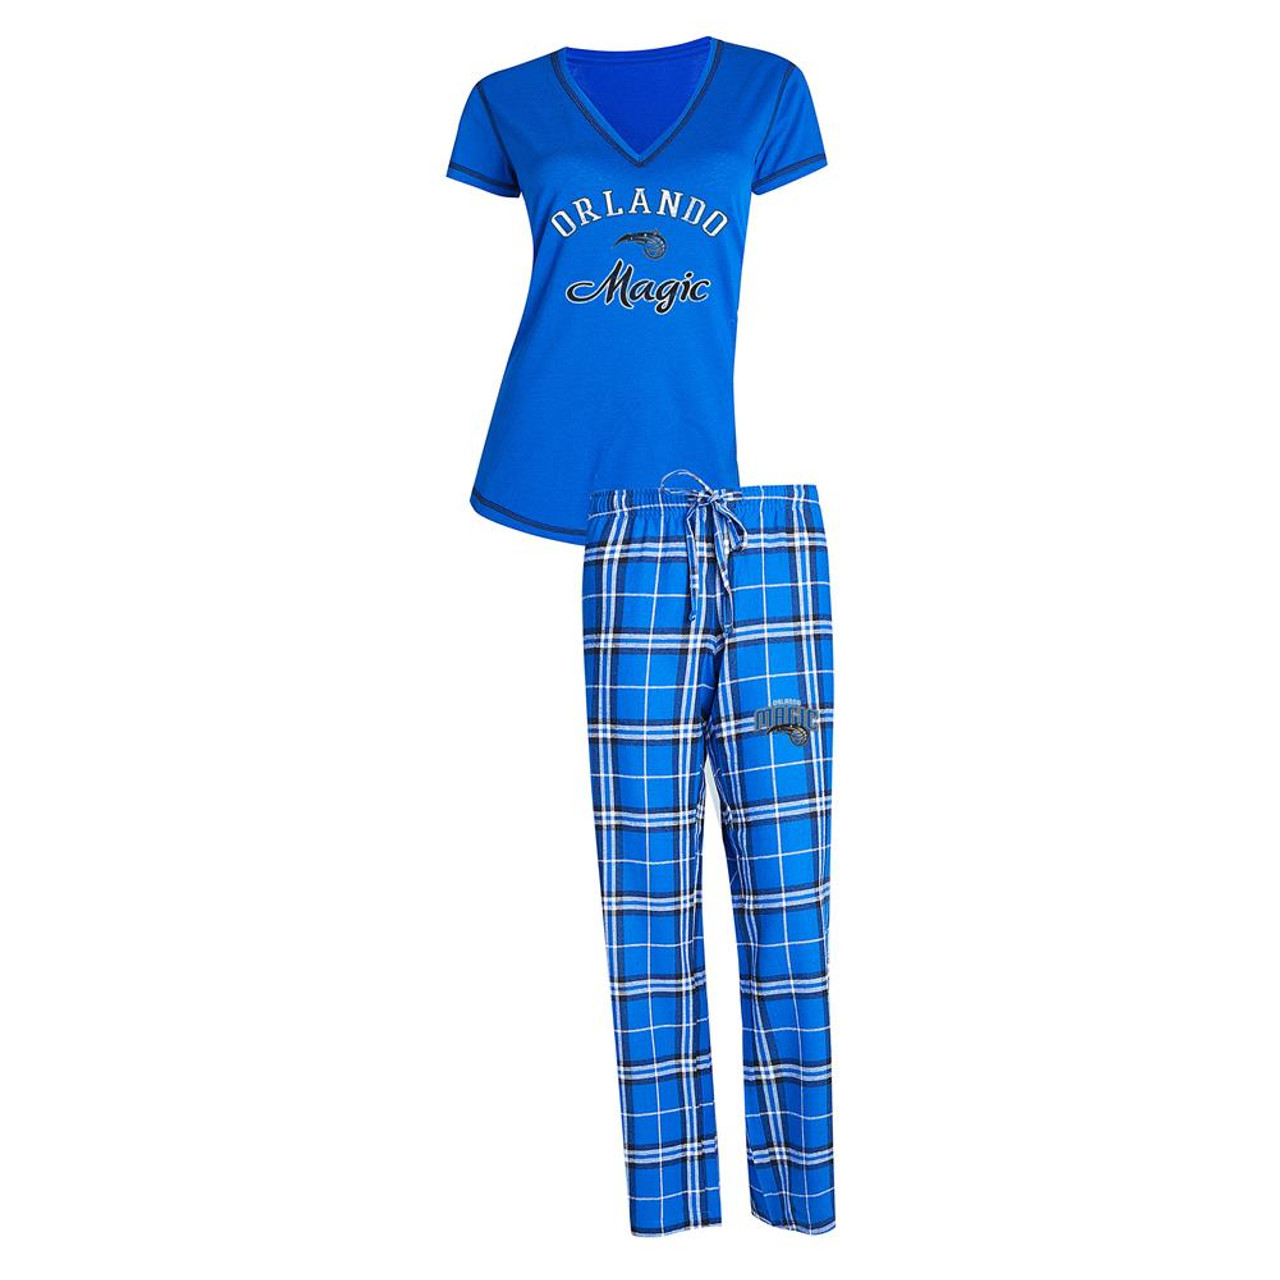 Orlando Magic Women's Pajama Set Duo Sleep Set